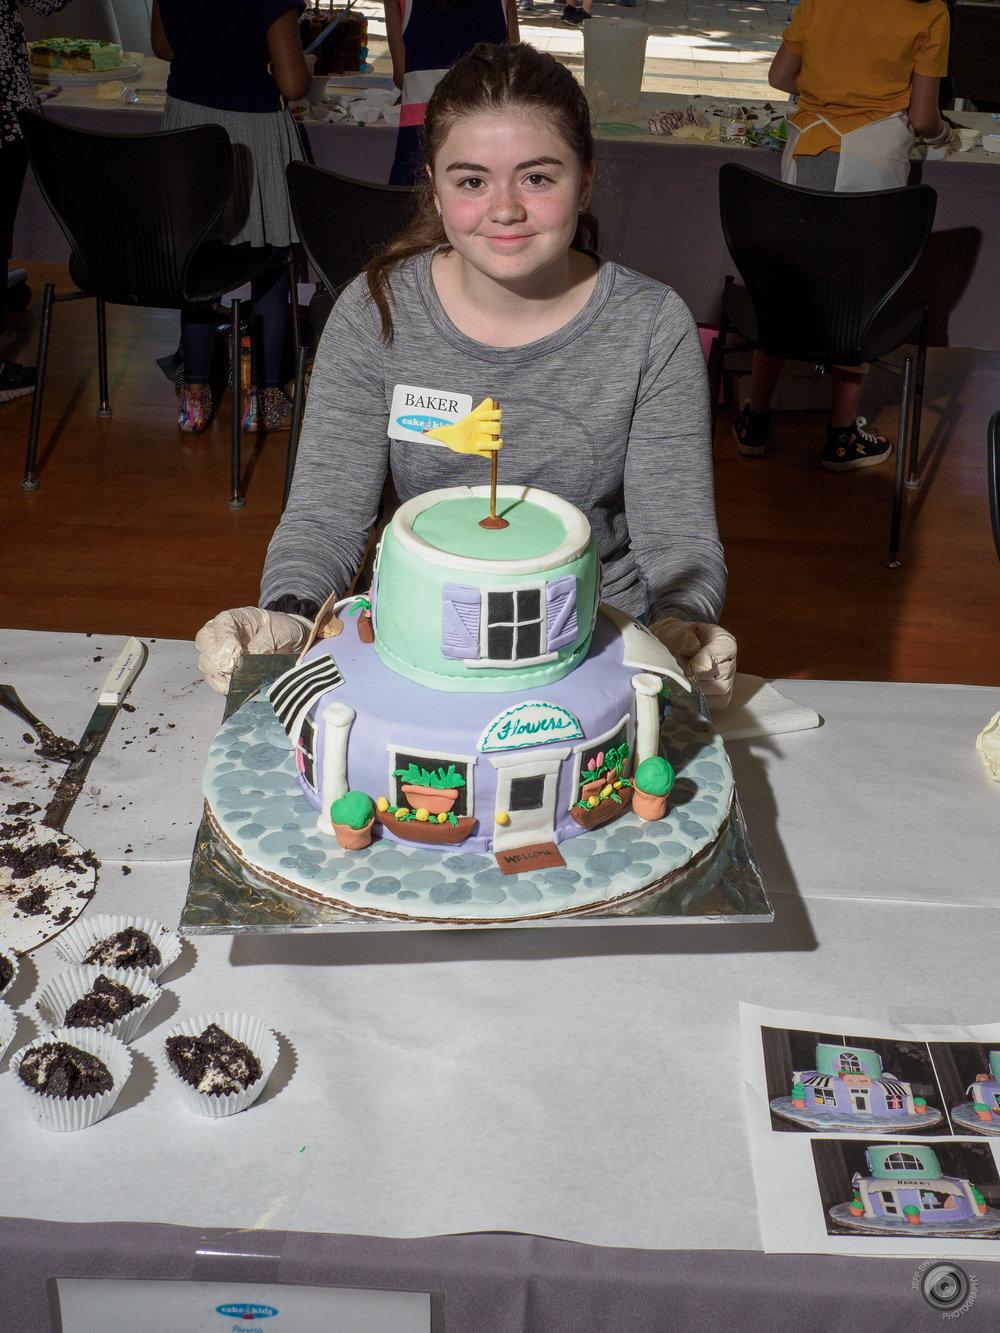 2018 Cake-Off4Kids-53.jpg